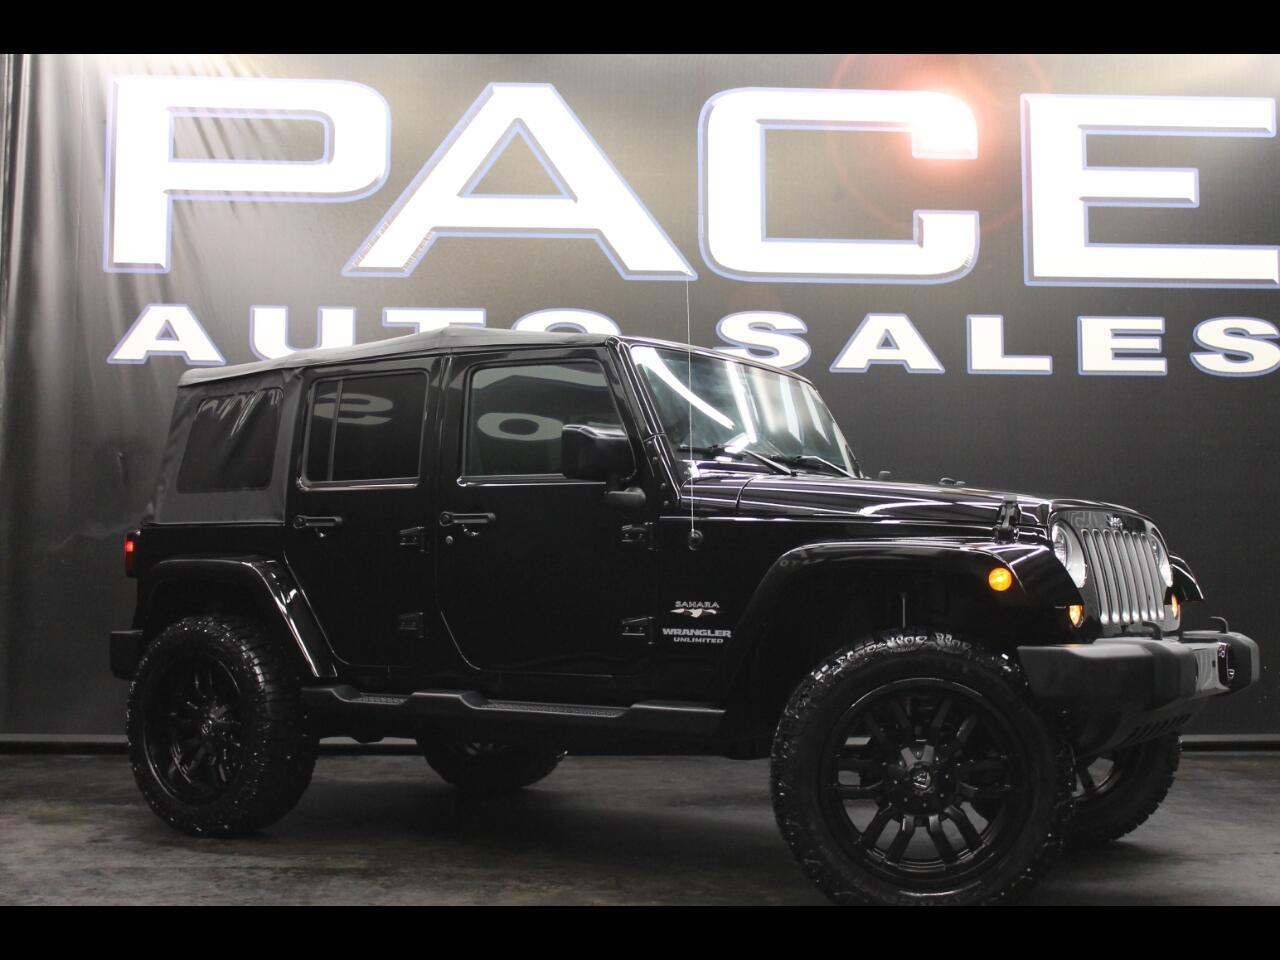 2017 Jeep Wrangler Unlimited Sahara 4x4 Lifted Custom